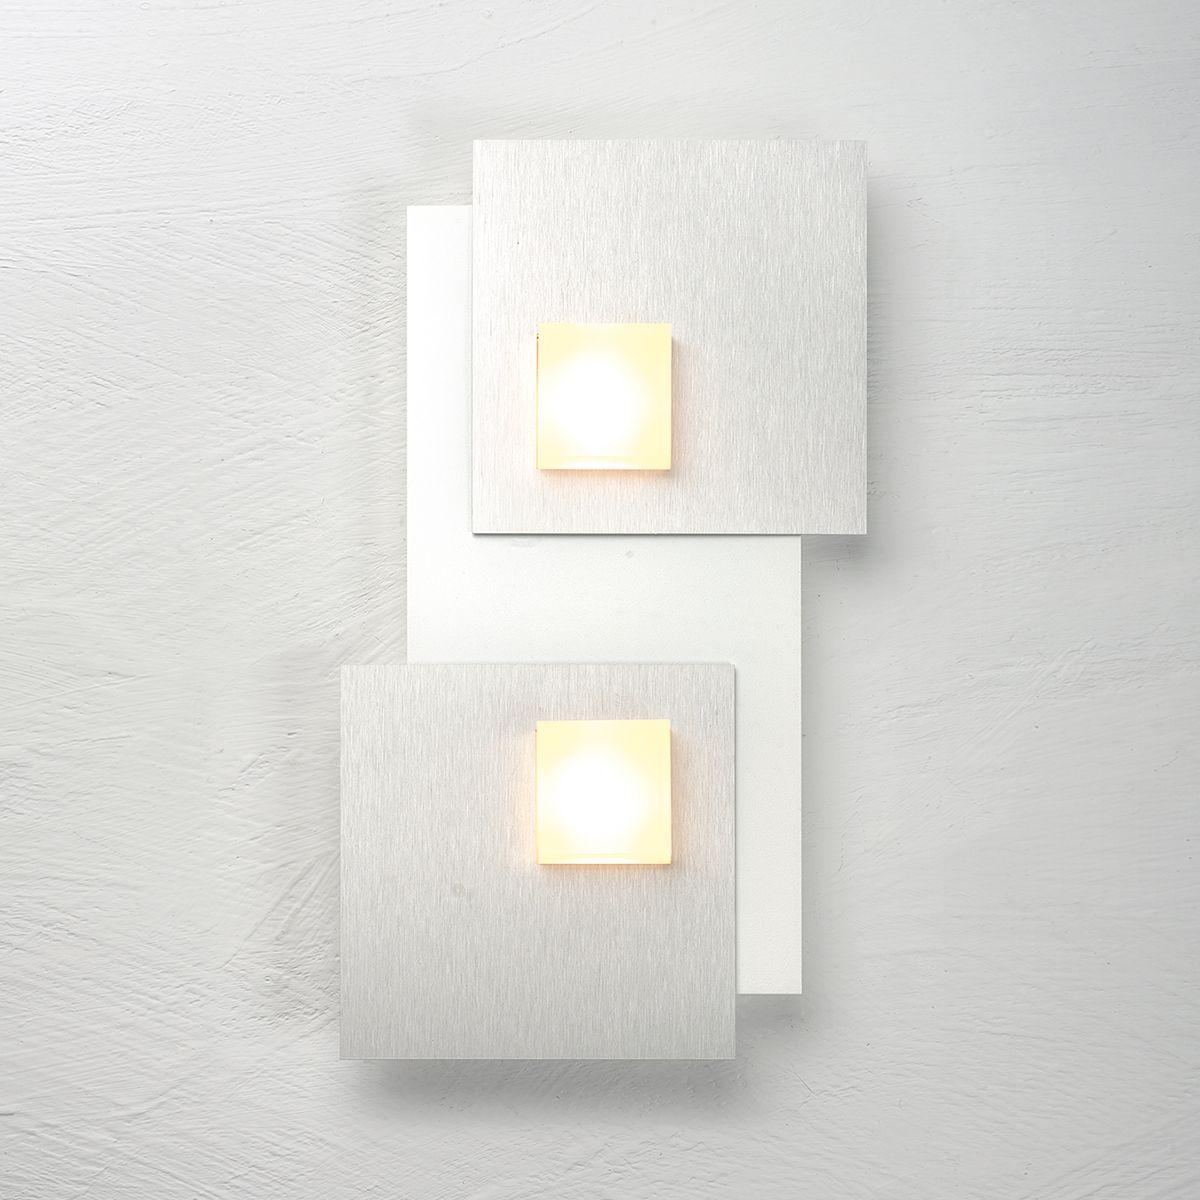 Bopp LeuchtenPIXEL 2.0 LED- DECKENLEUCHTE 2-FLAMMIG63880209